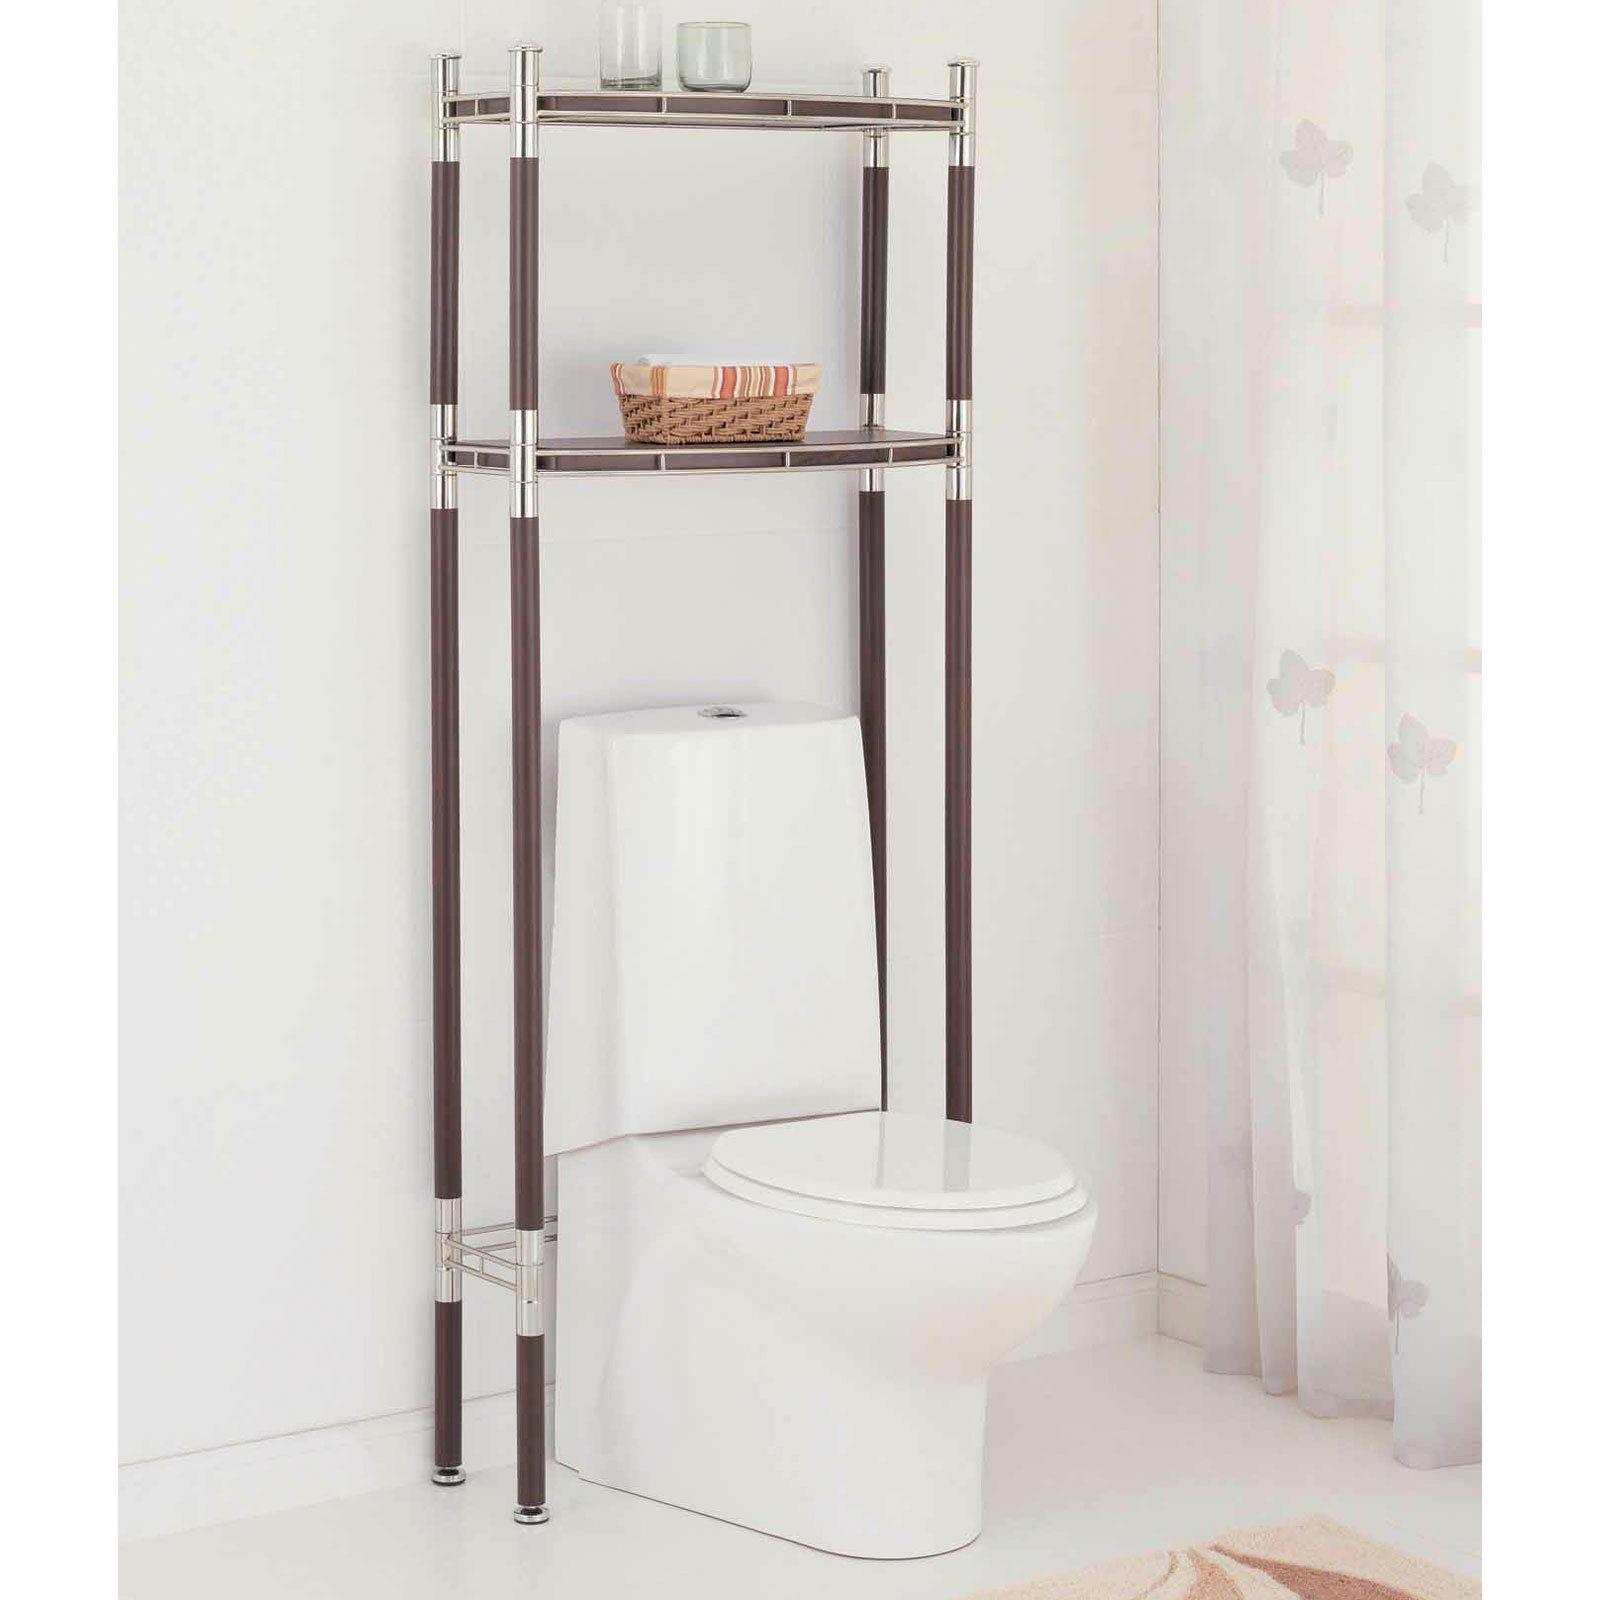 over the toilet storage Baronial Shelf Space Saver | bathroom design ...